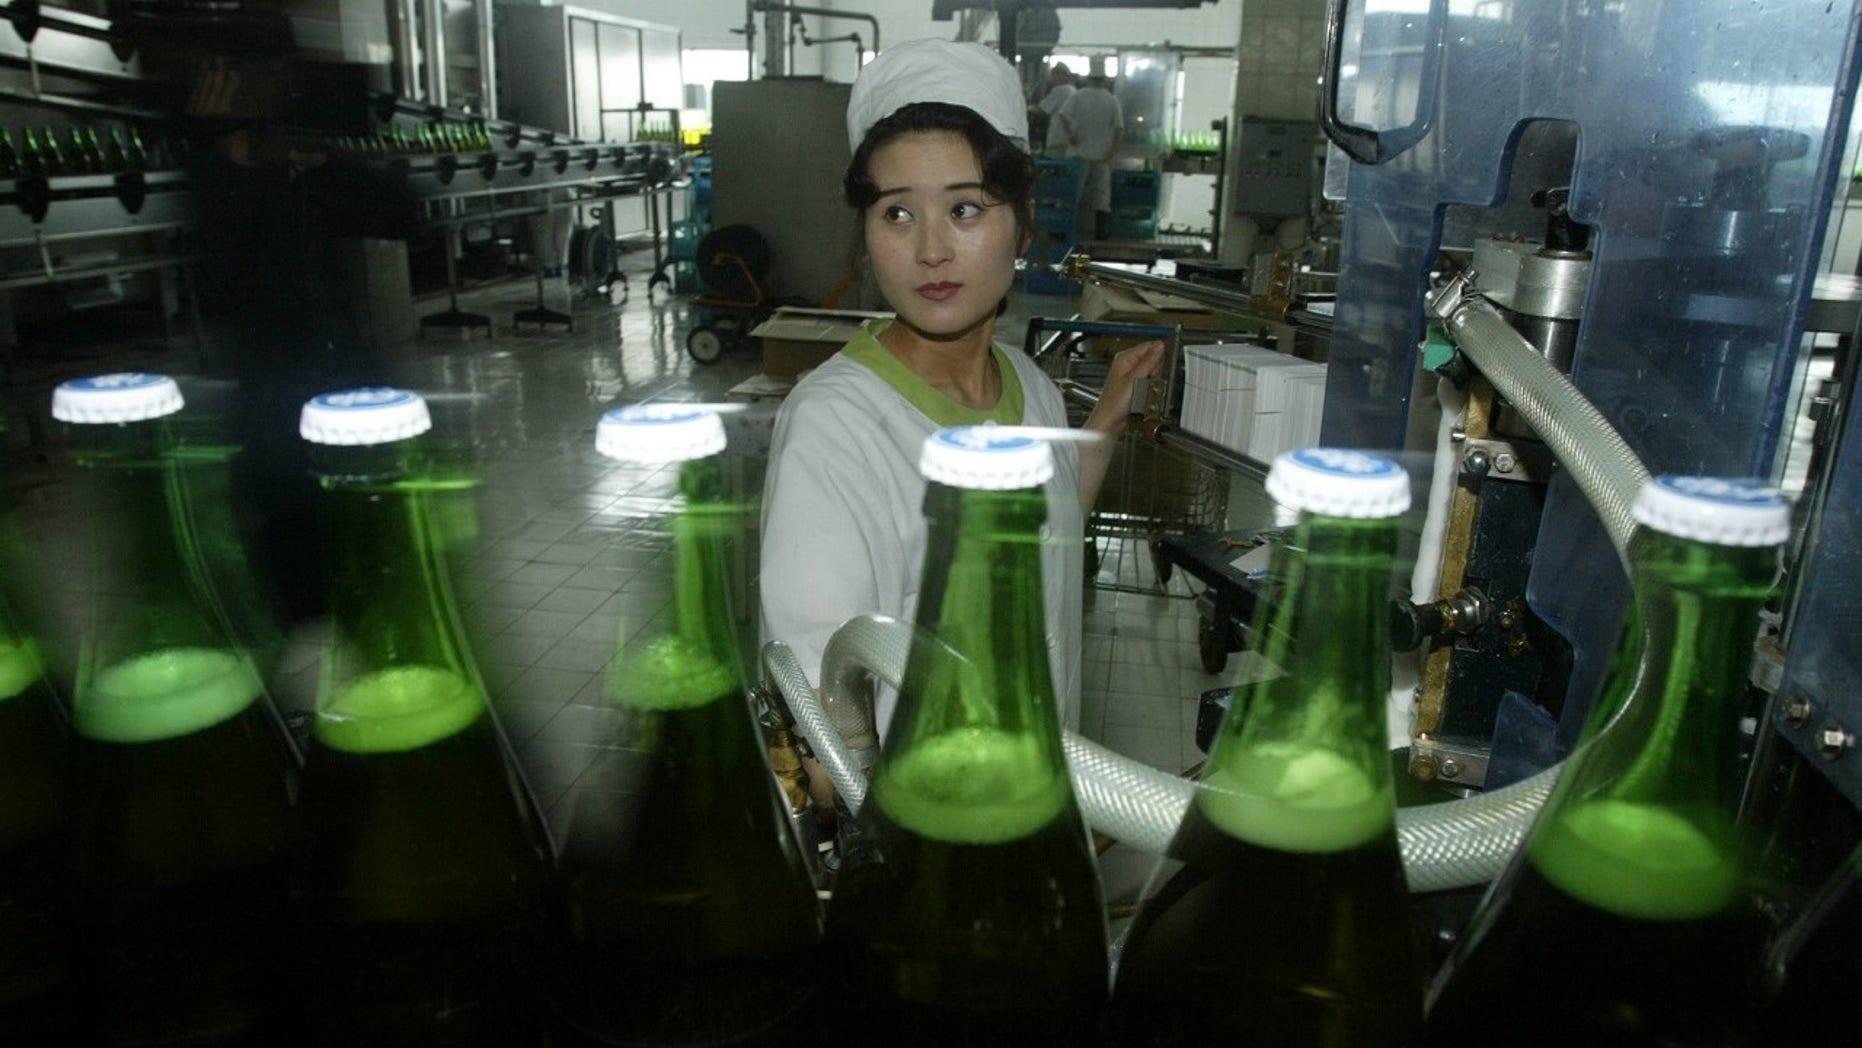 North Korean women work at the Taedonggang Beer factory in 2008.